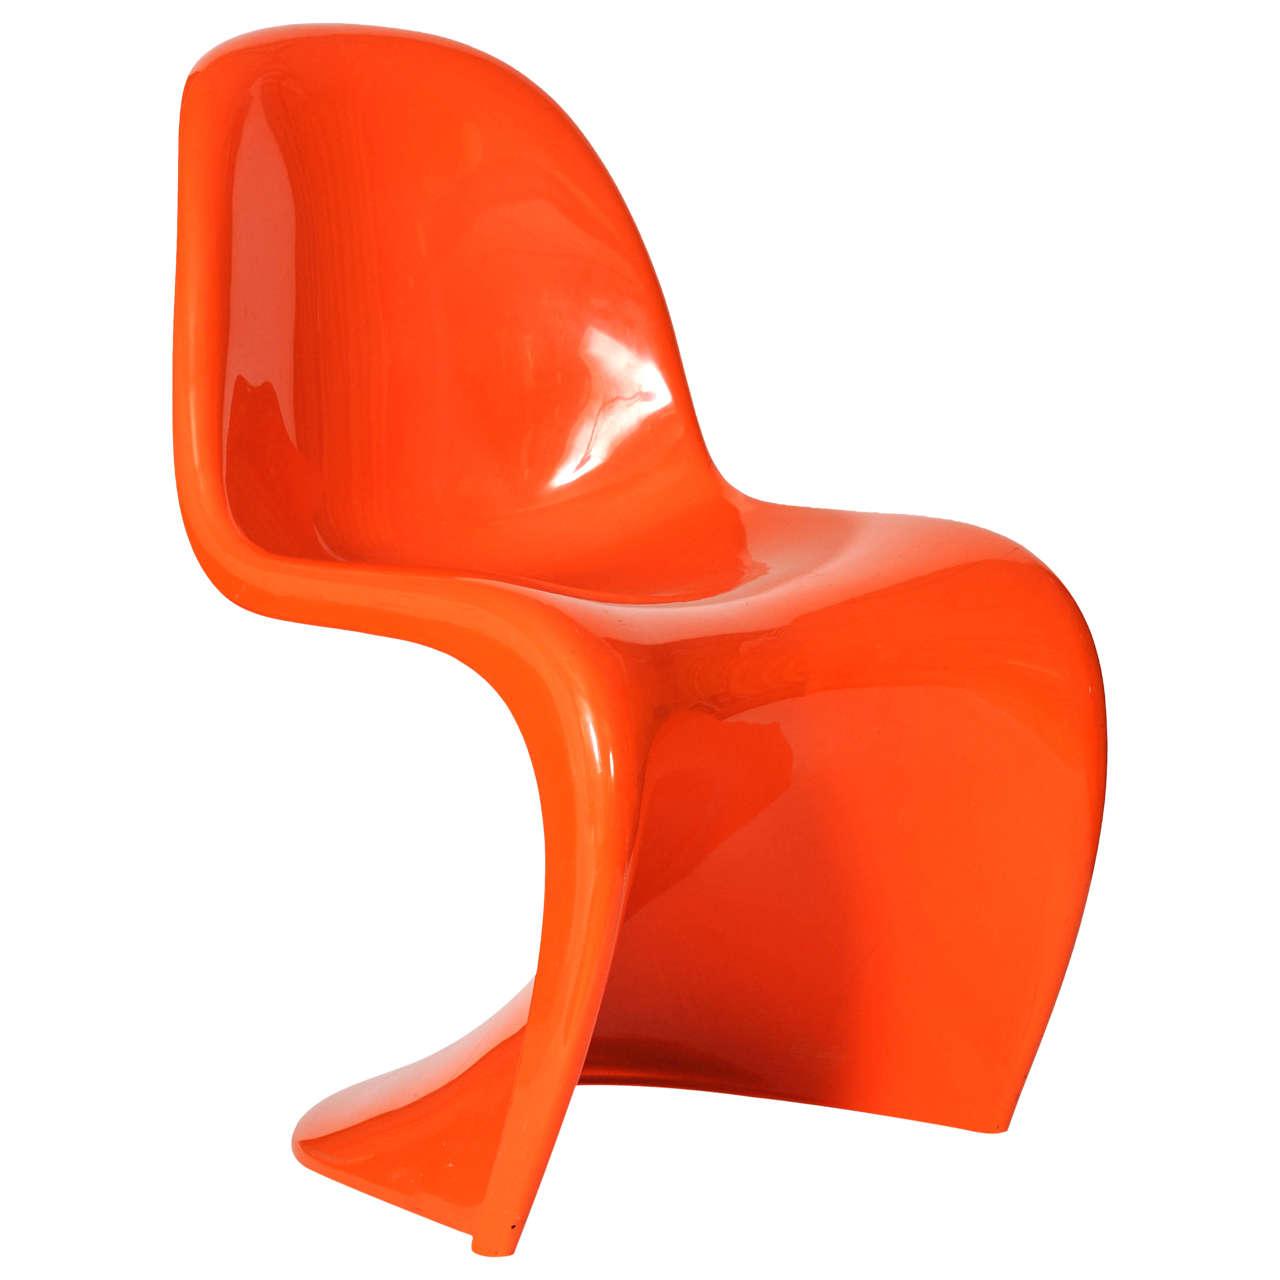 Original Panton Chair set of two original panton s chairs for sale at 1stdibs